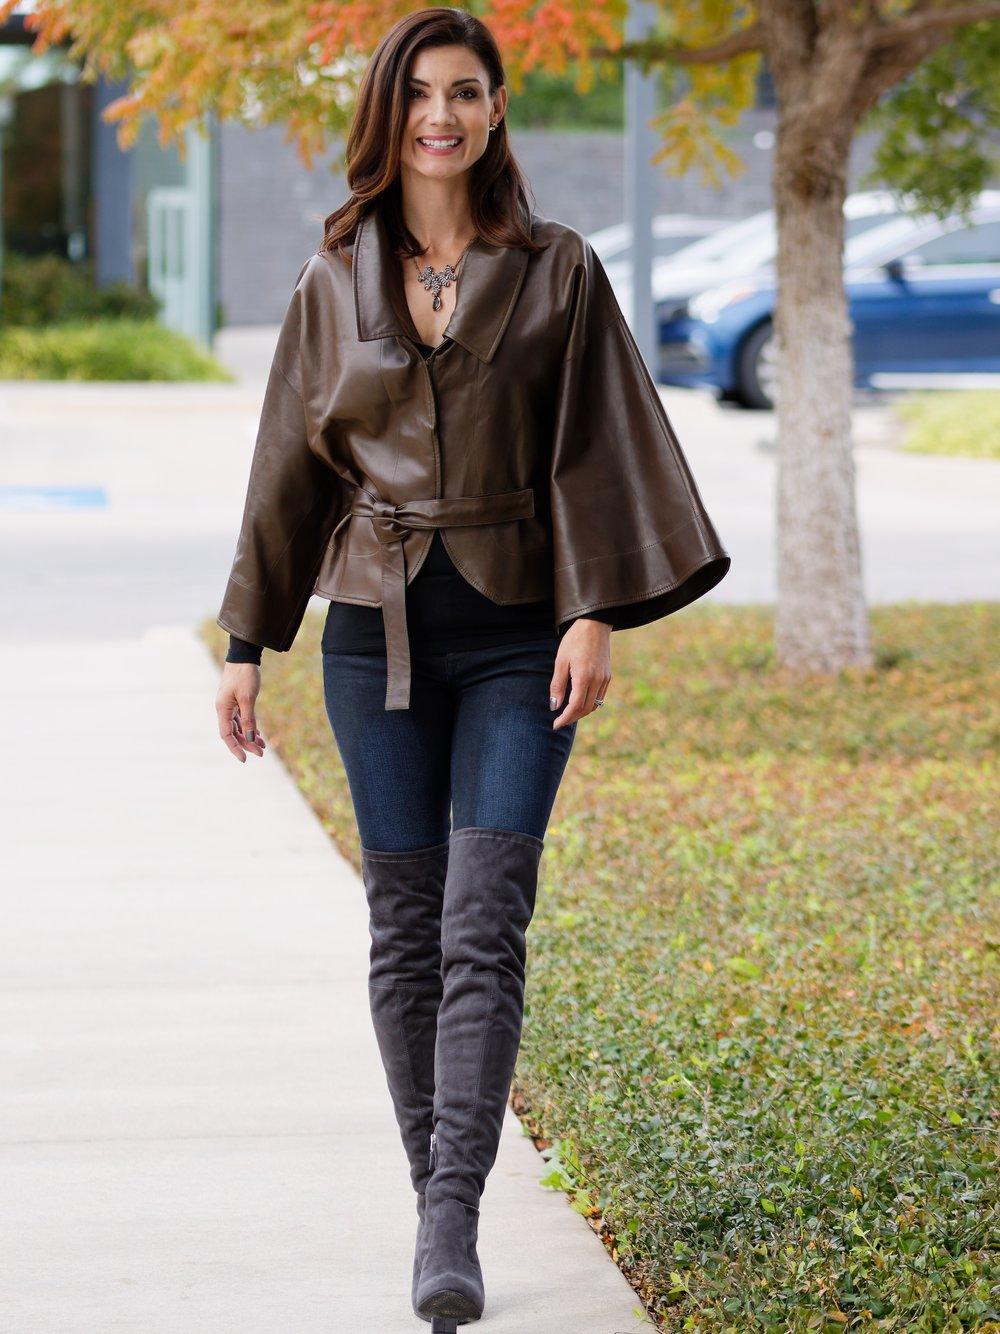 Meta Leather Convertible Jacket